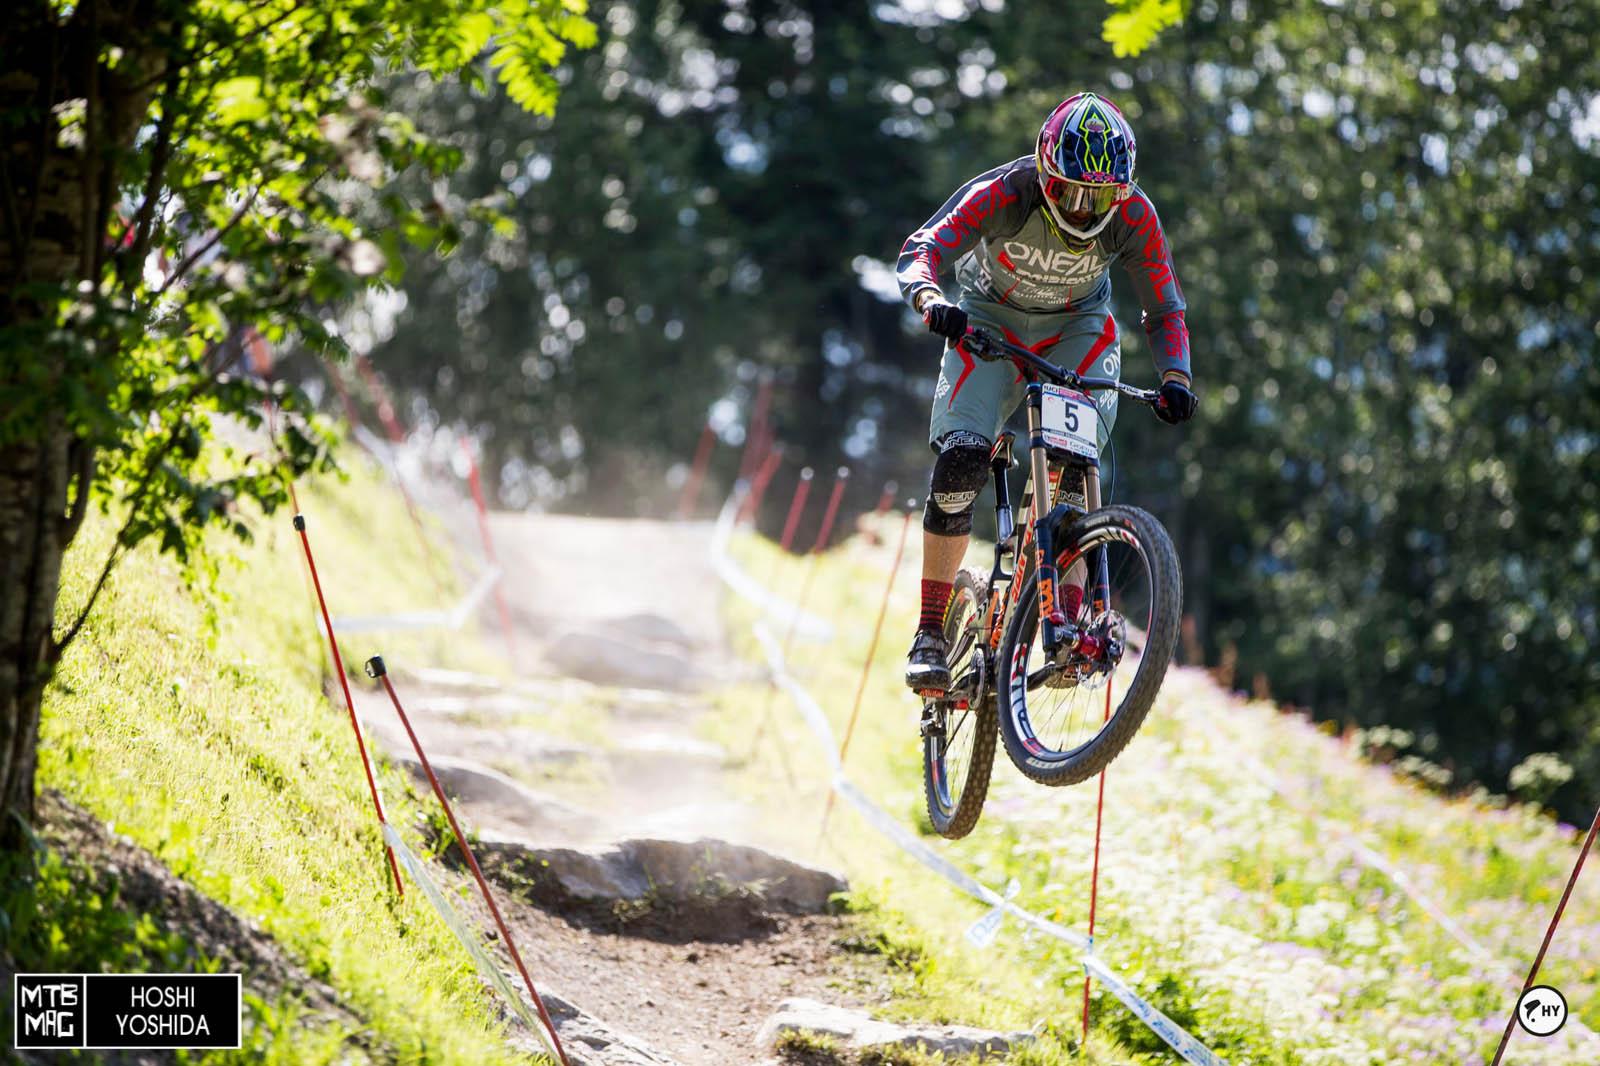 Will he be on the top spot also this weekend? Greg Minnaar